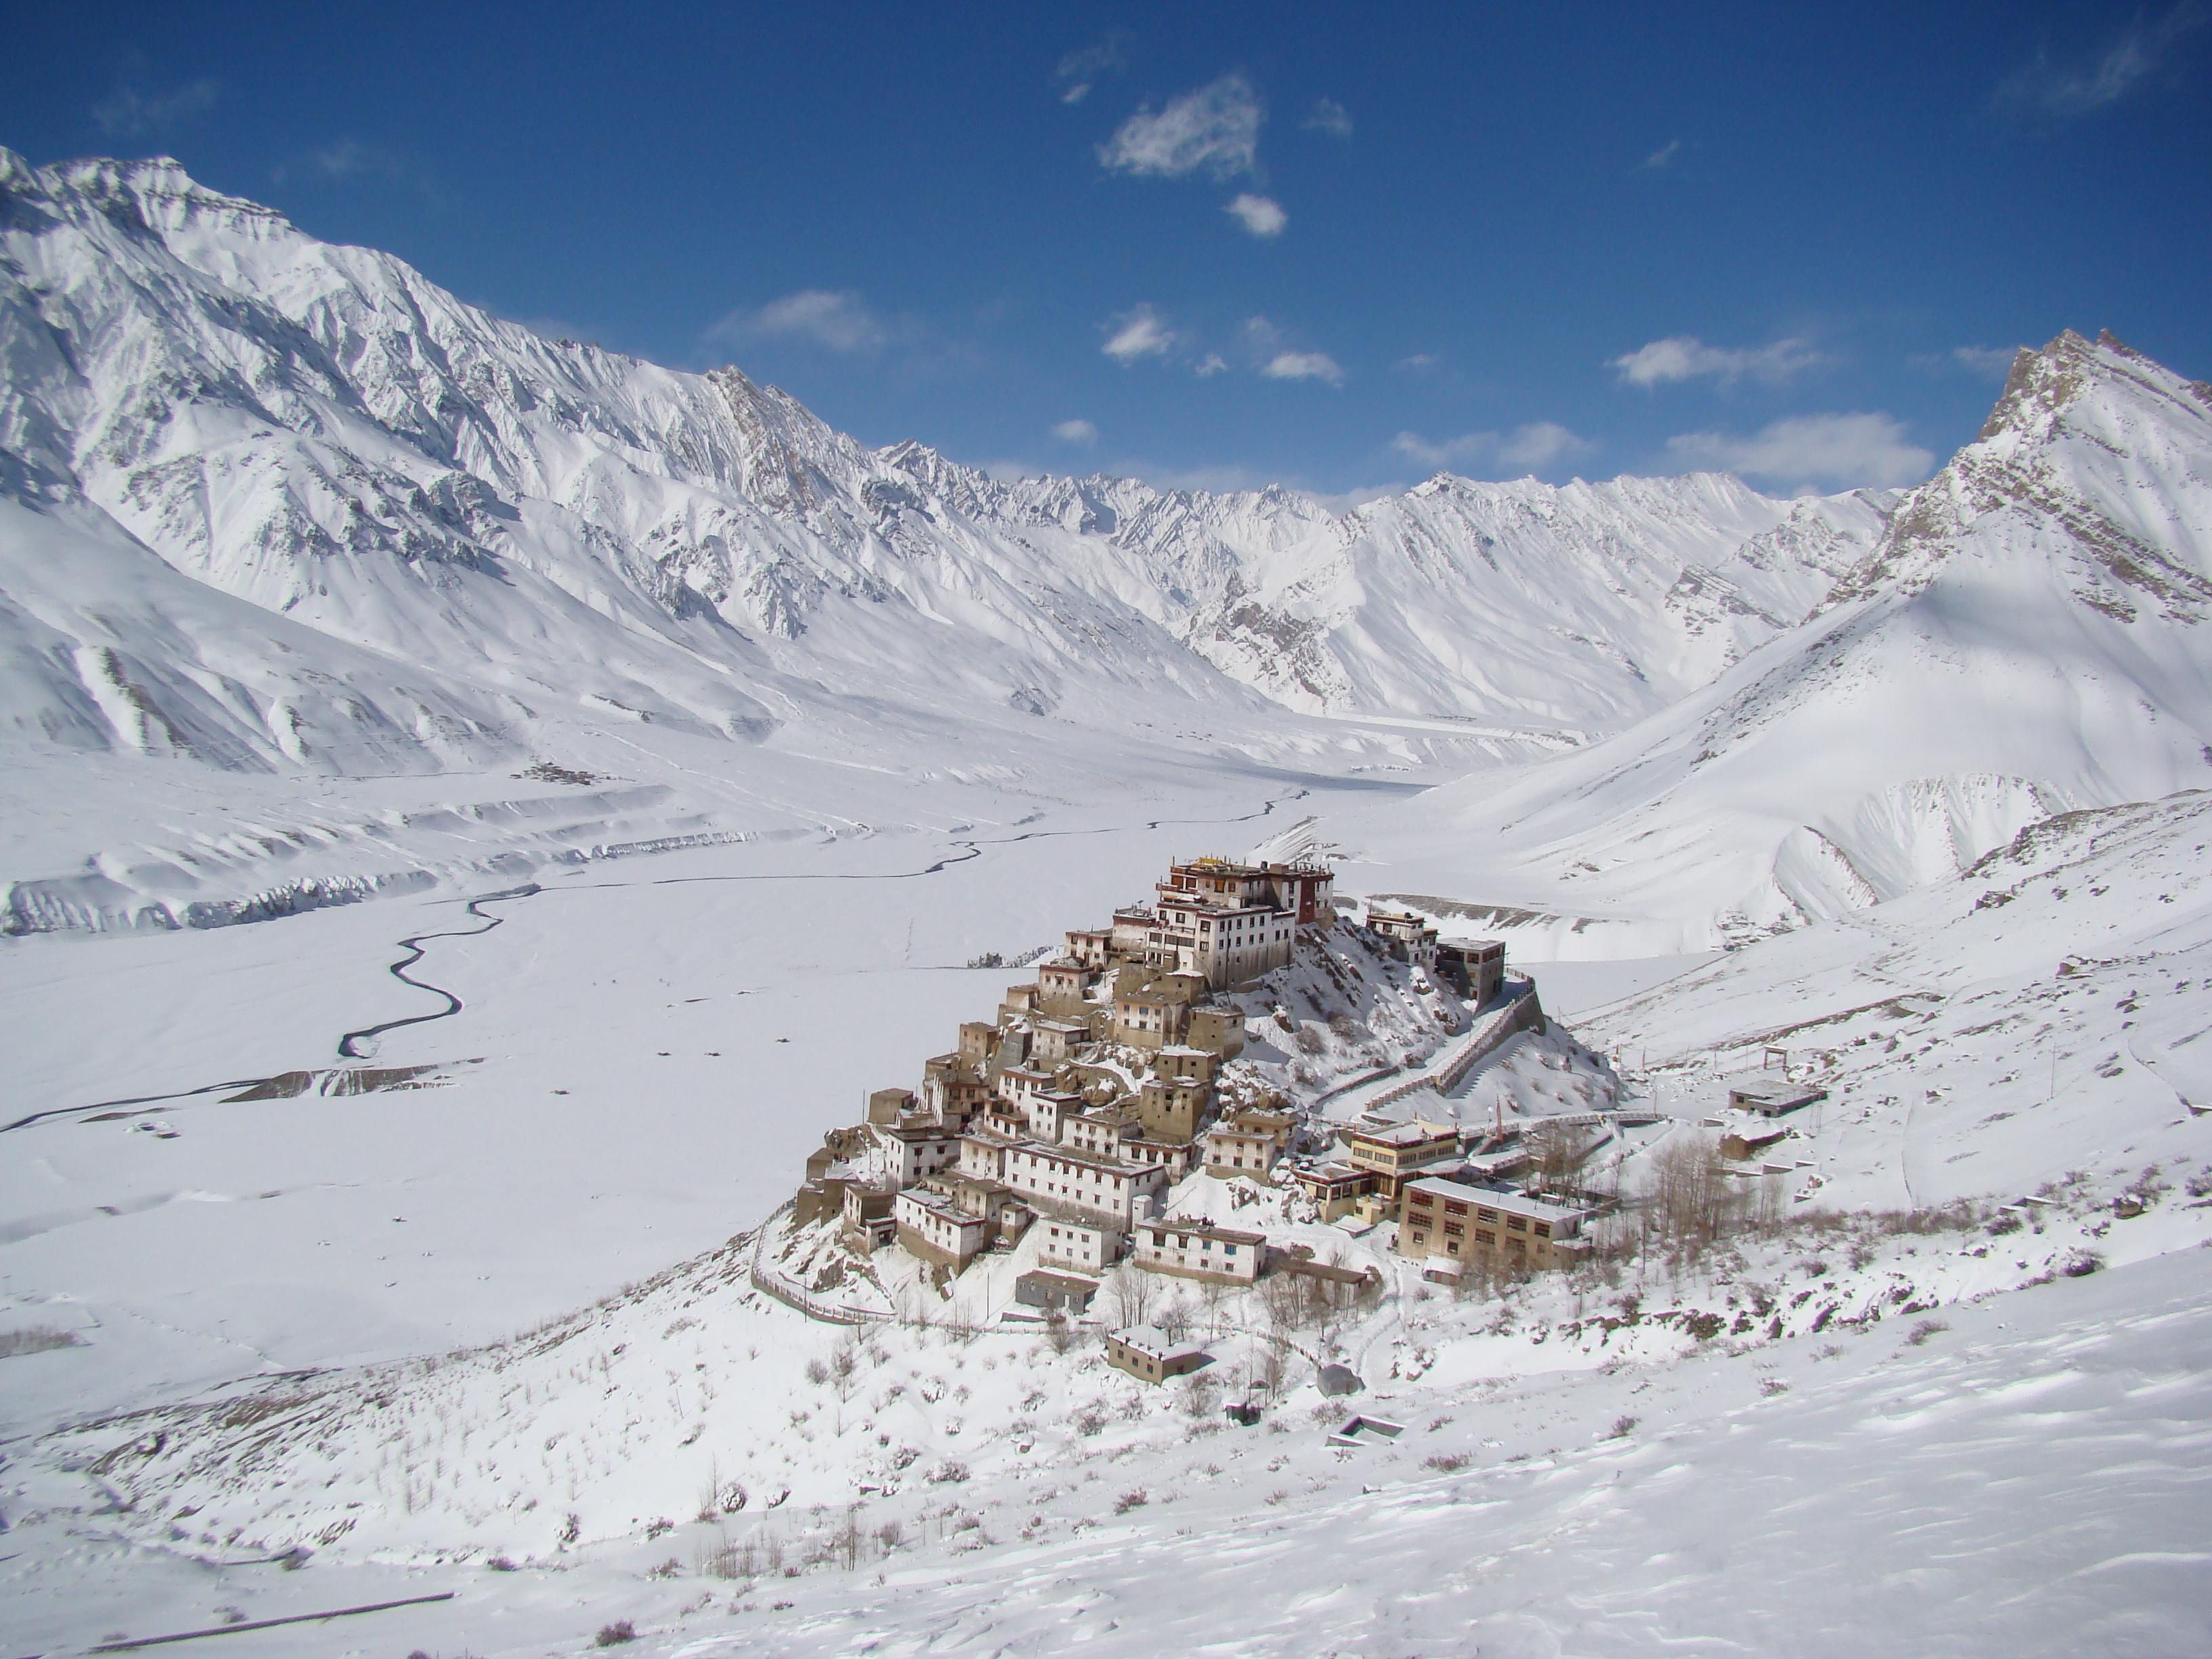 Kee_monastery_Spiti_Valley (1)